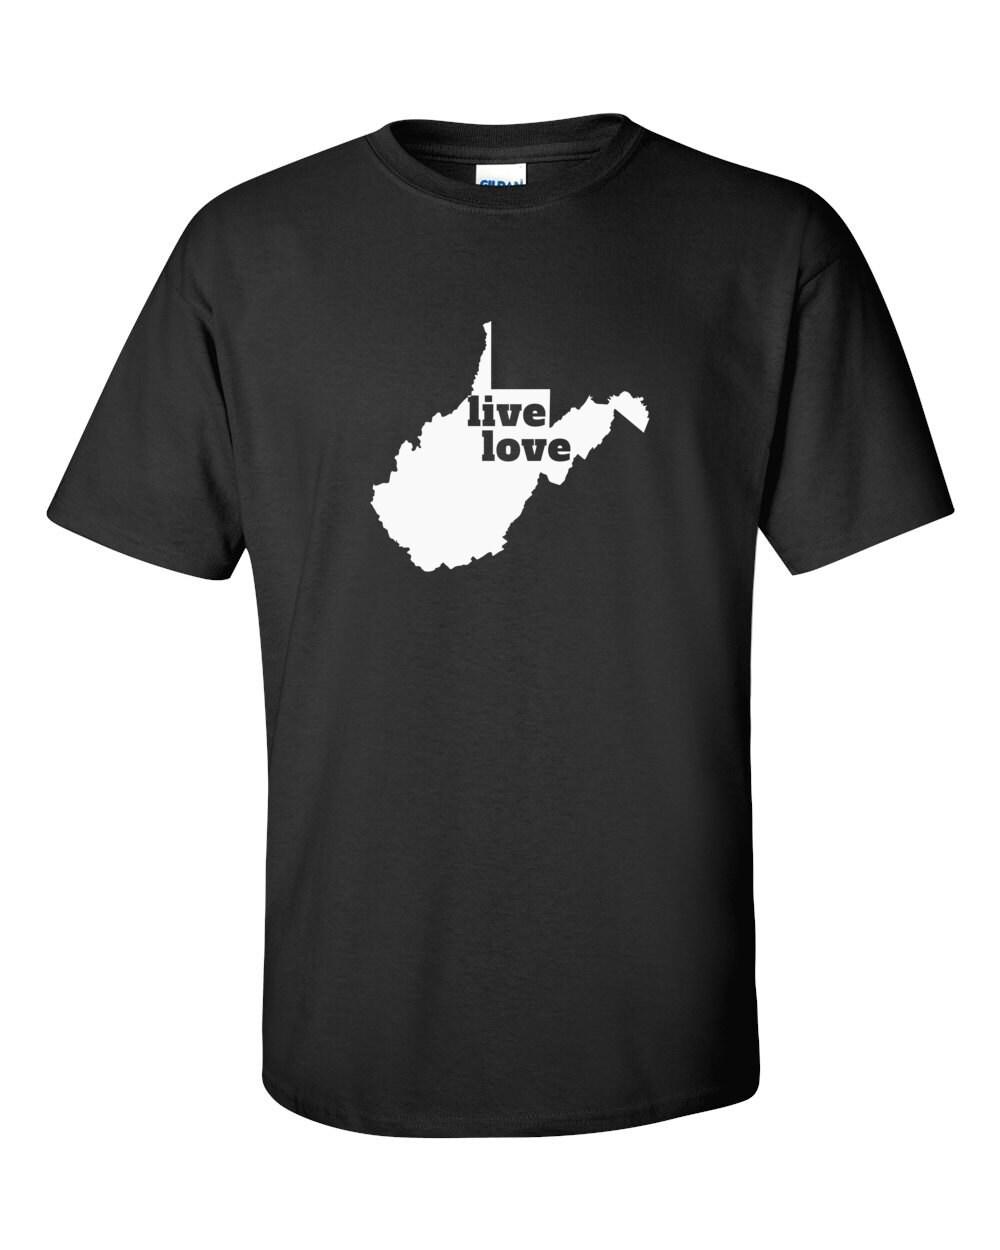 West Virginia T-shirt - Live Love West Virginia - My State West Virginia T-shirt